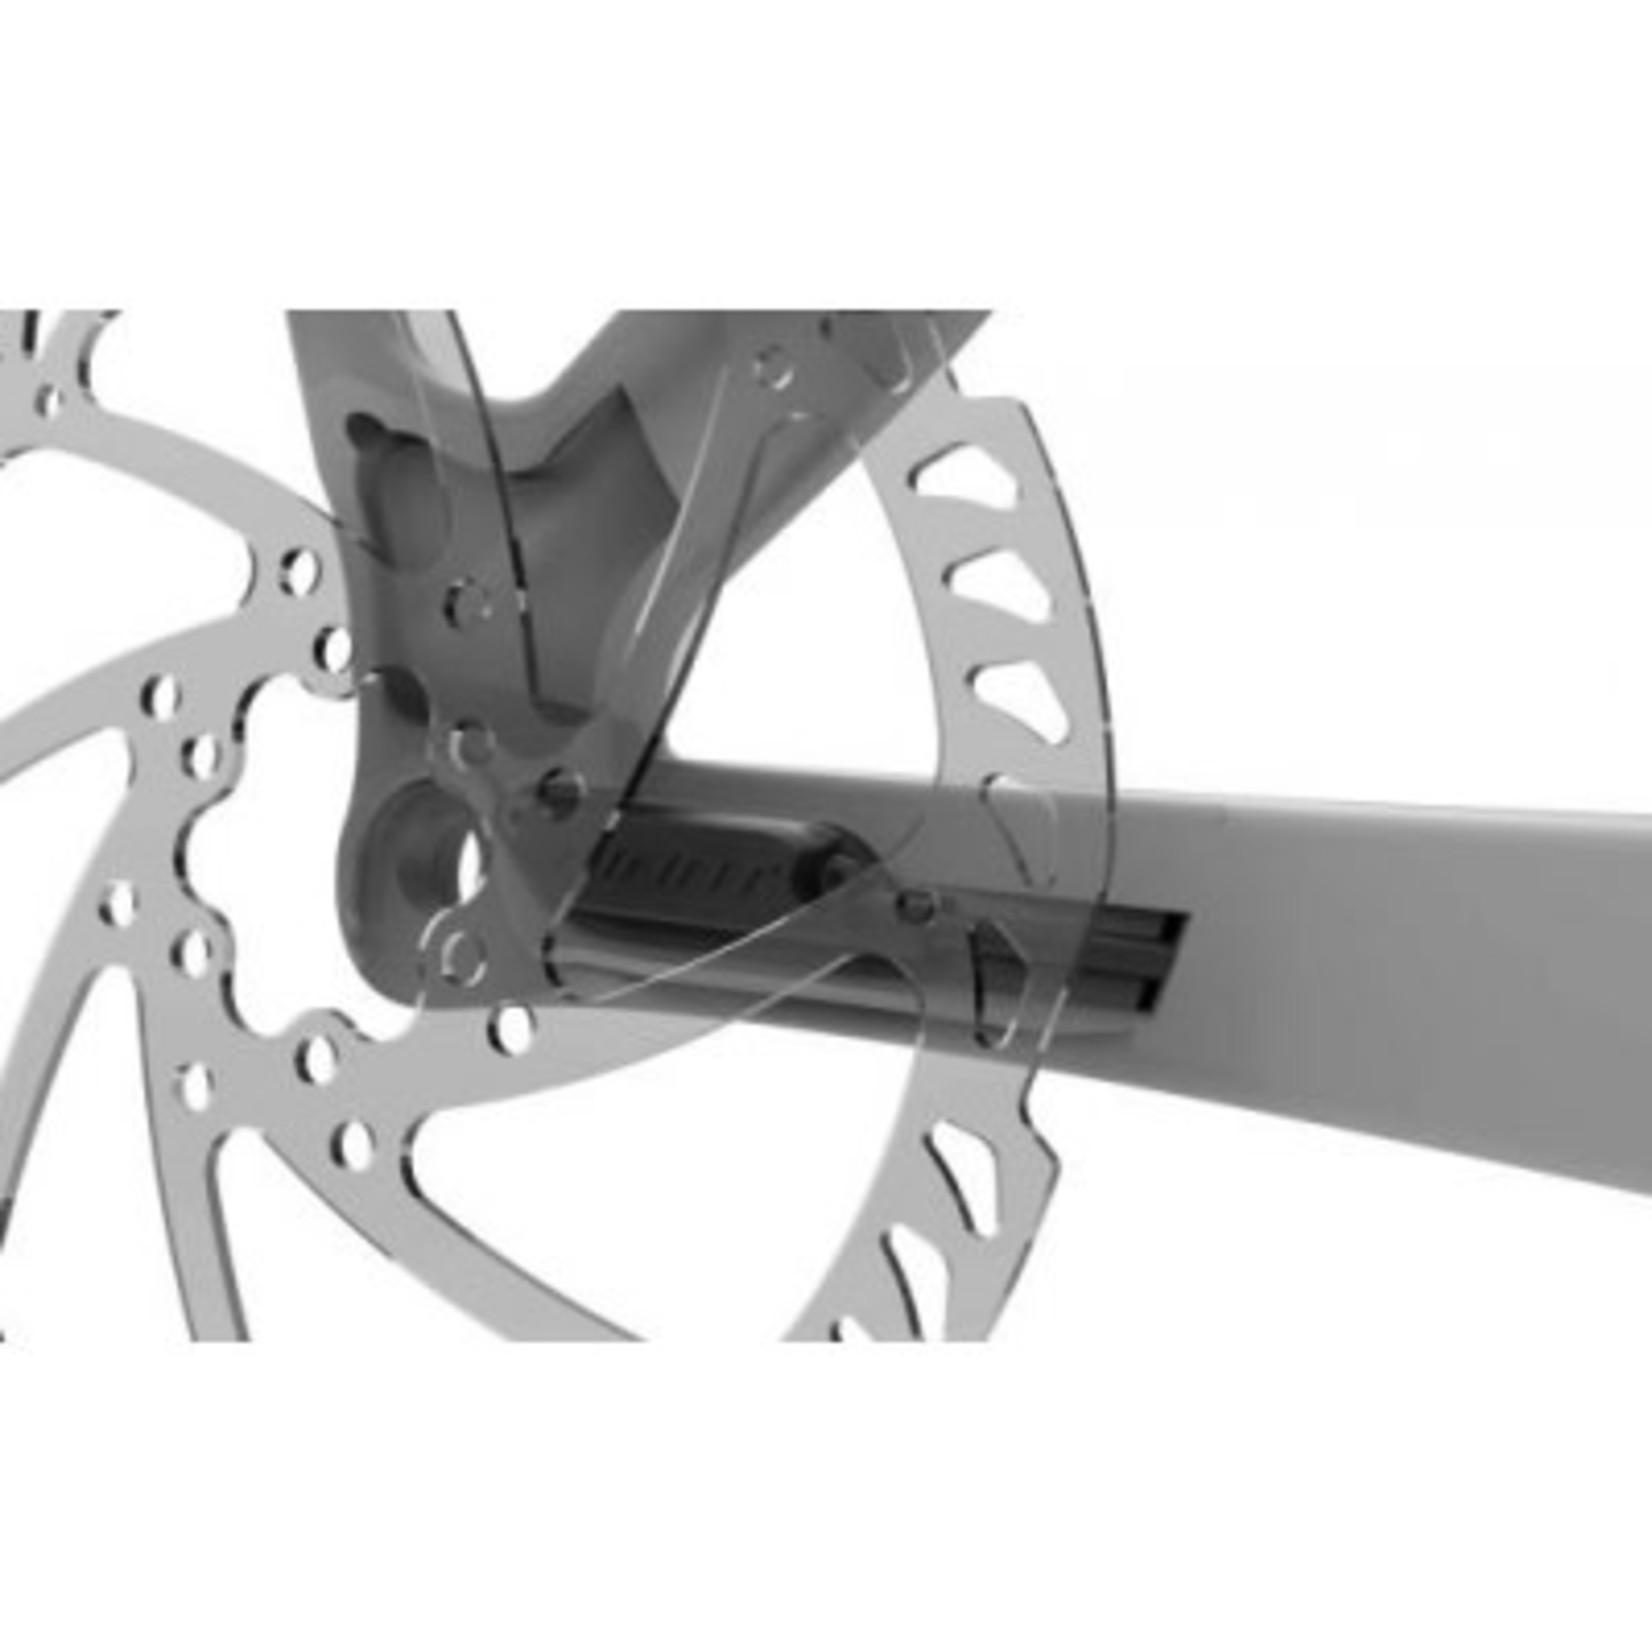 GIANT Giant E-Bike Speed Sensor MY20 Integrated Trance/Reign